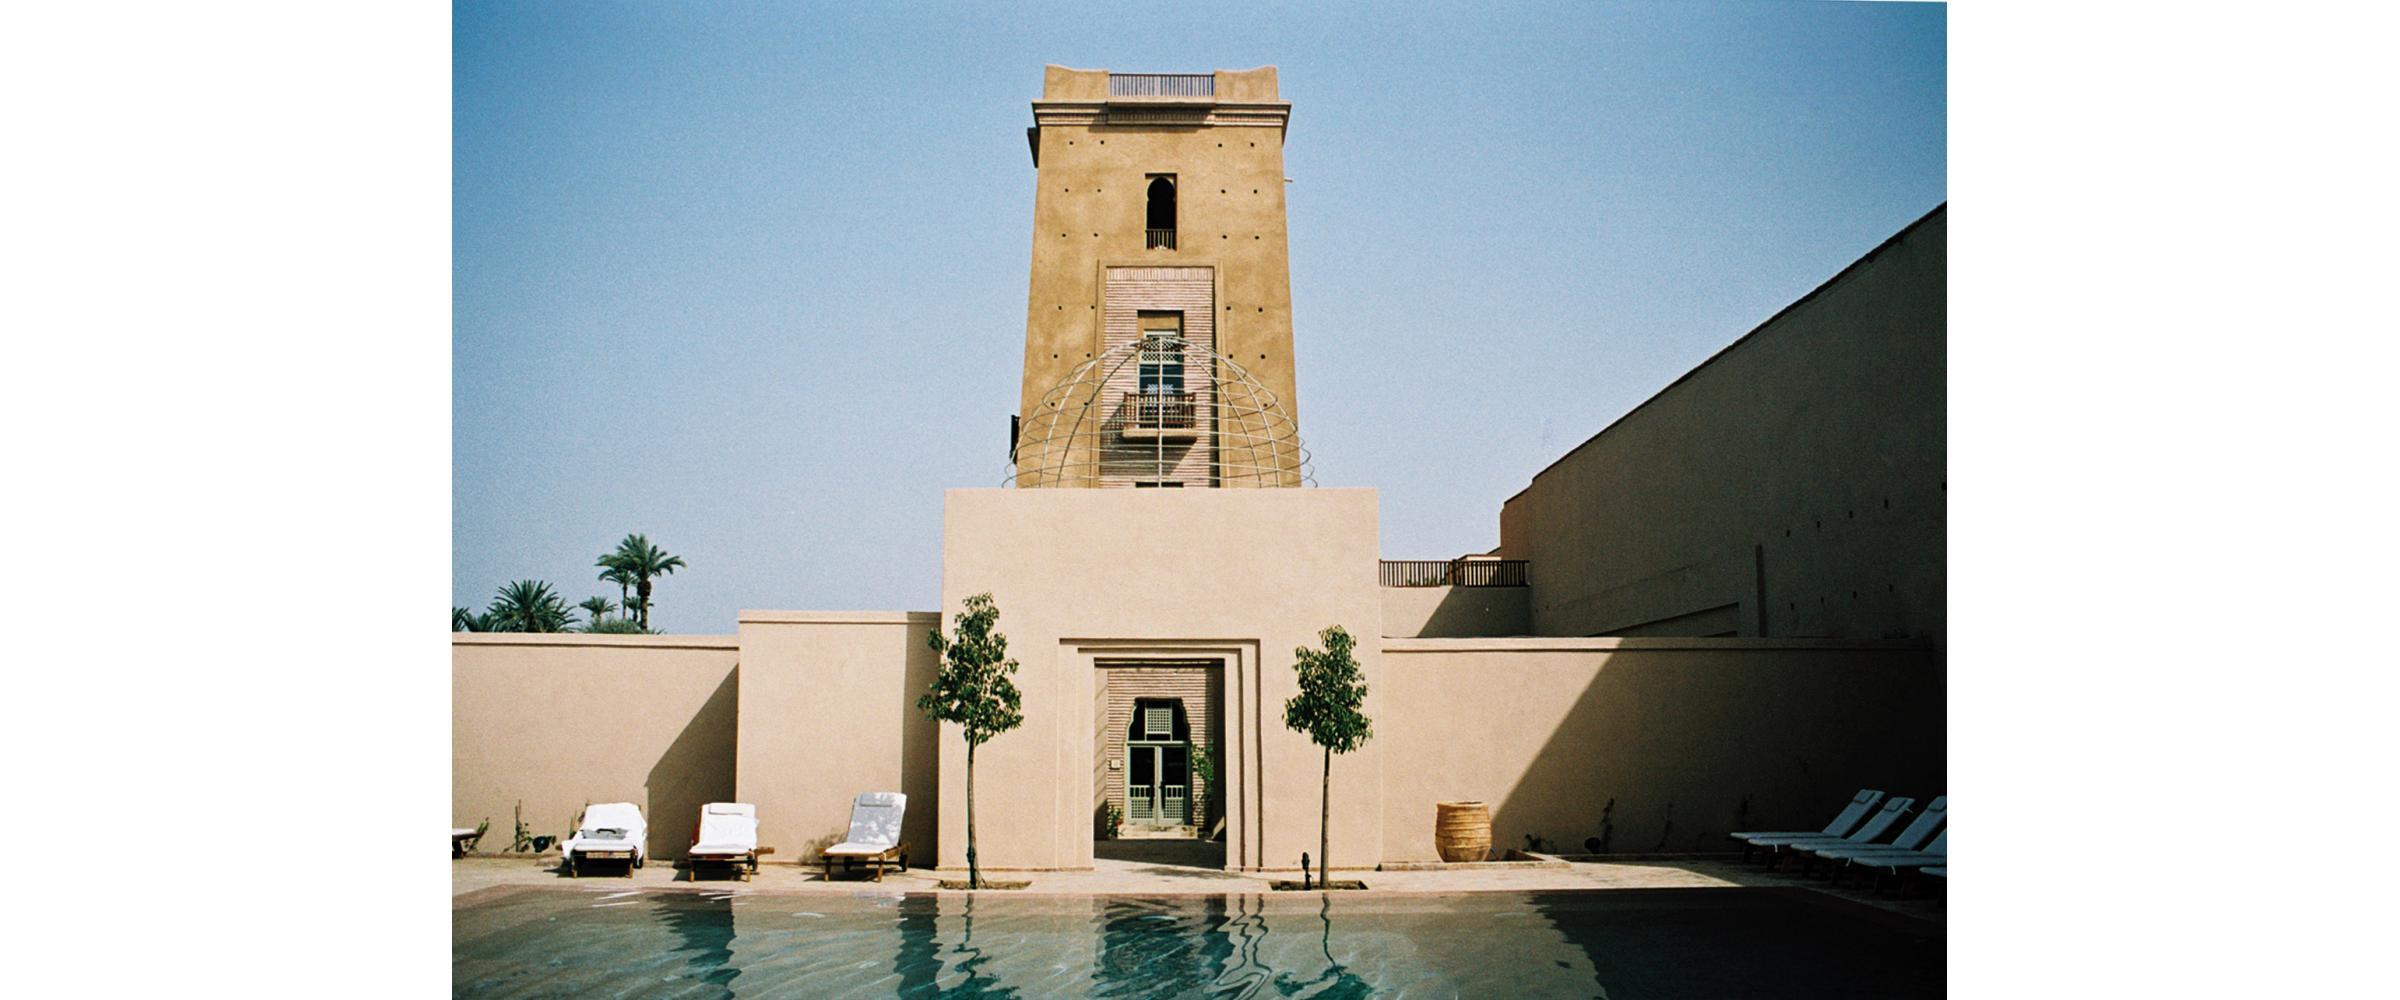 Hôtel 5 * Club Med Palmeraie Marrakech Maroc